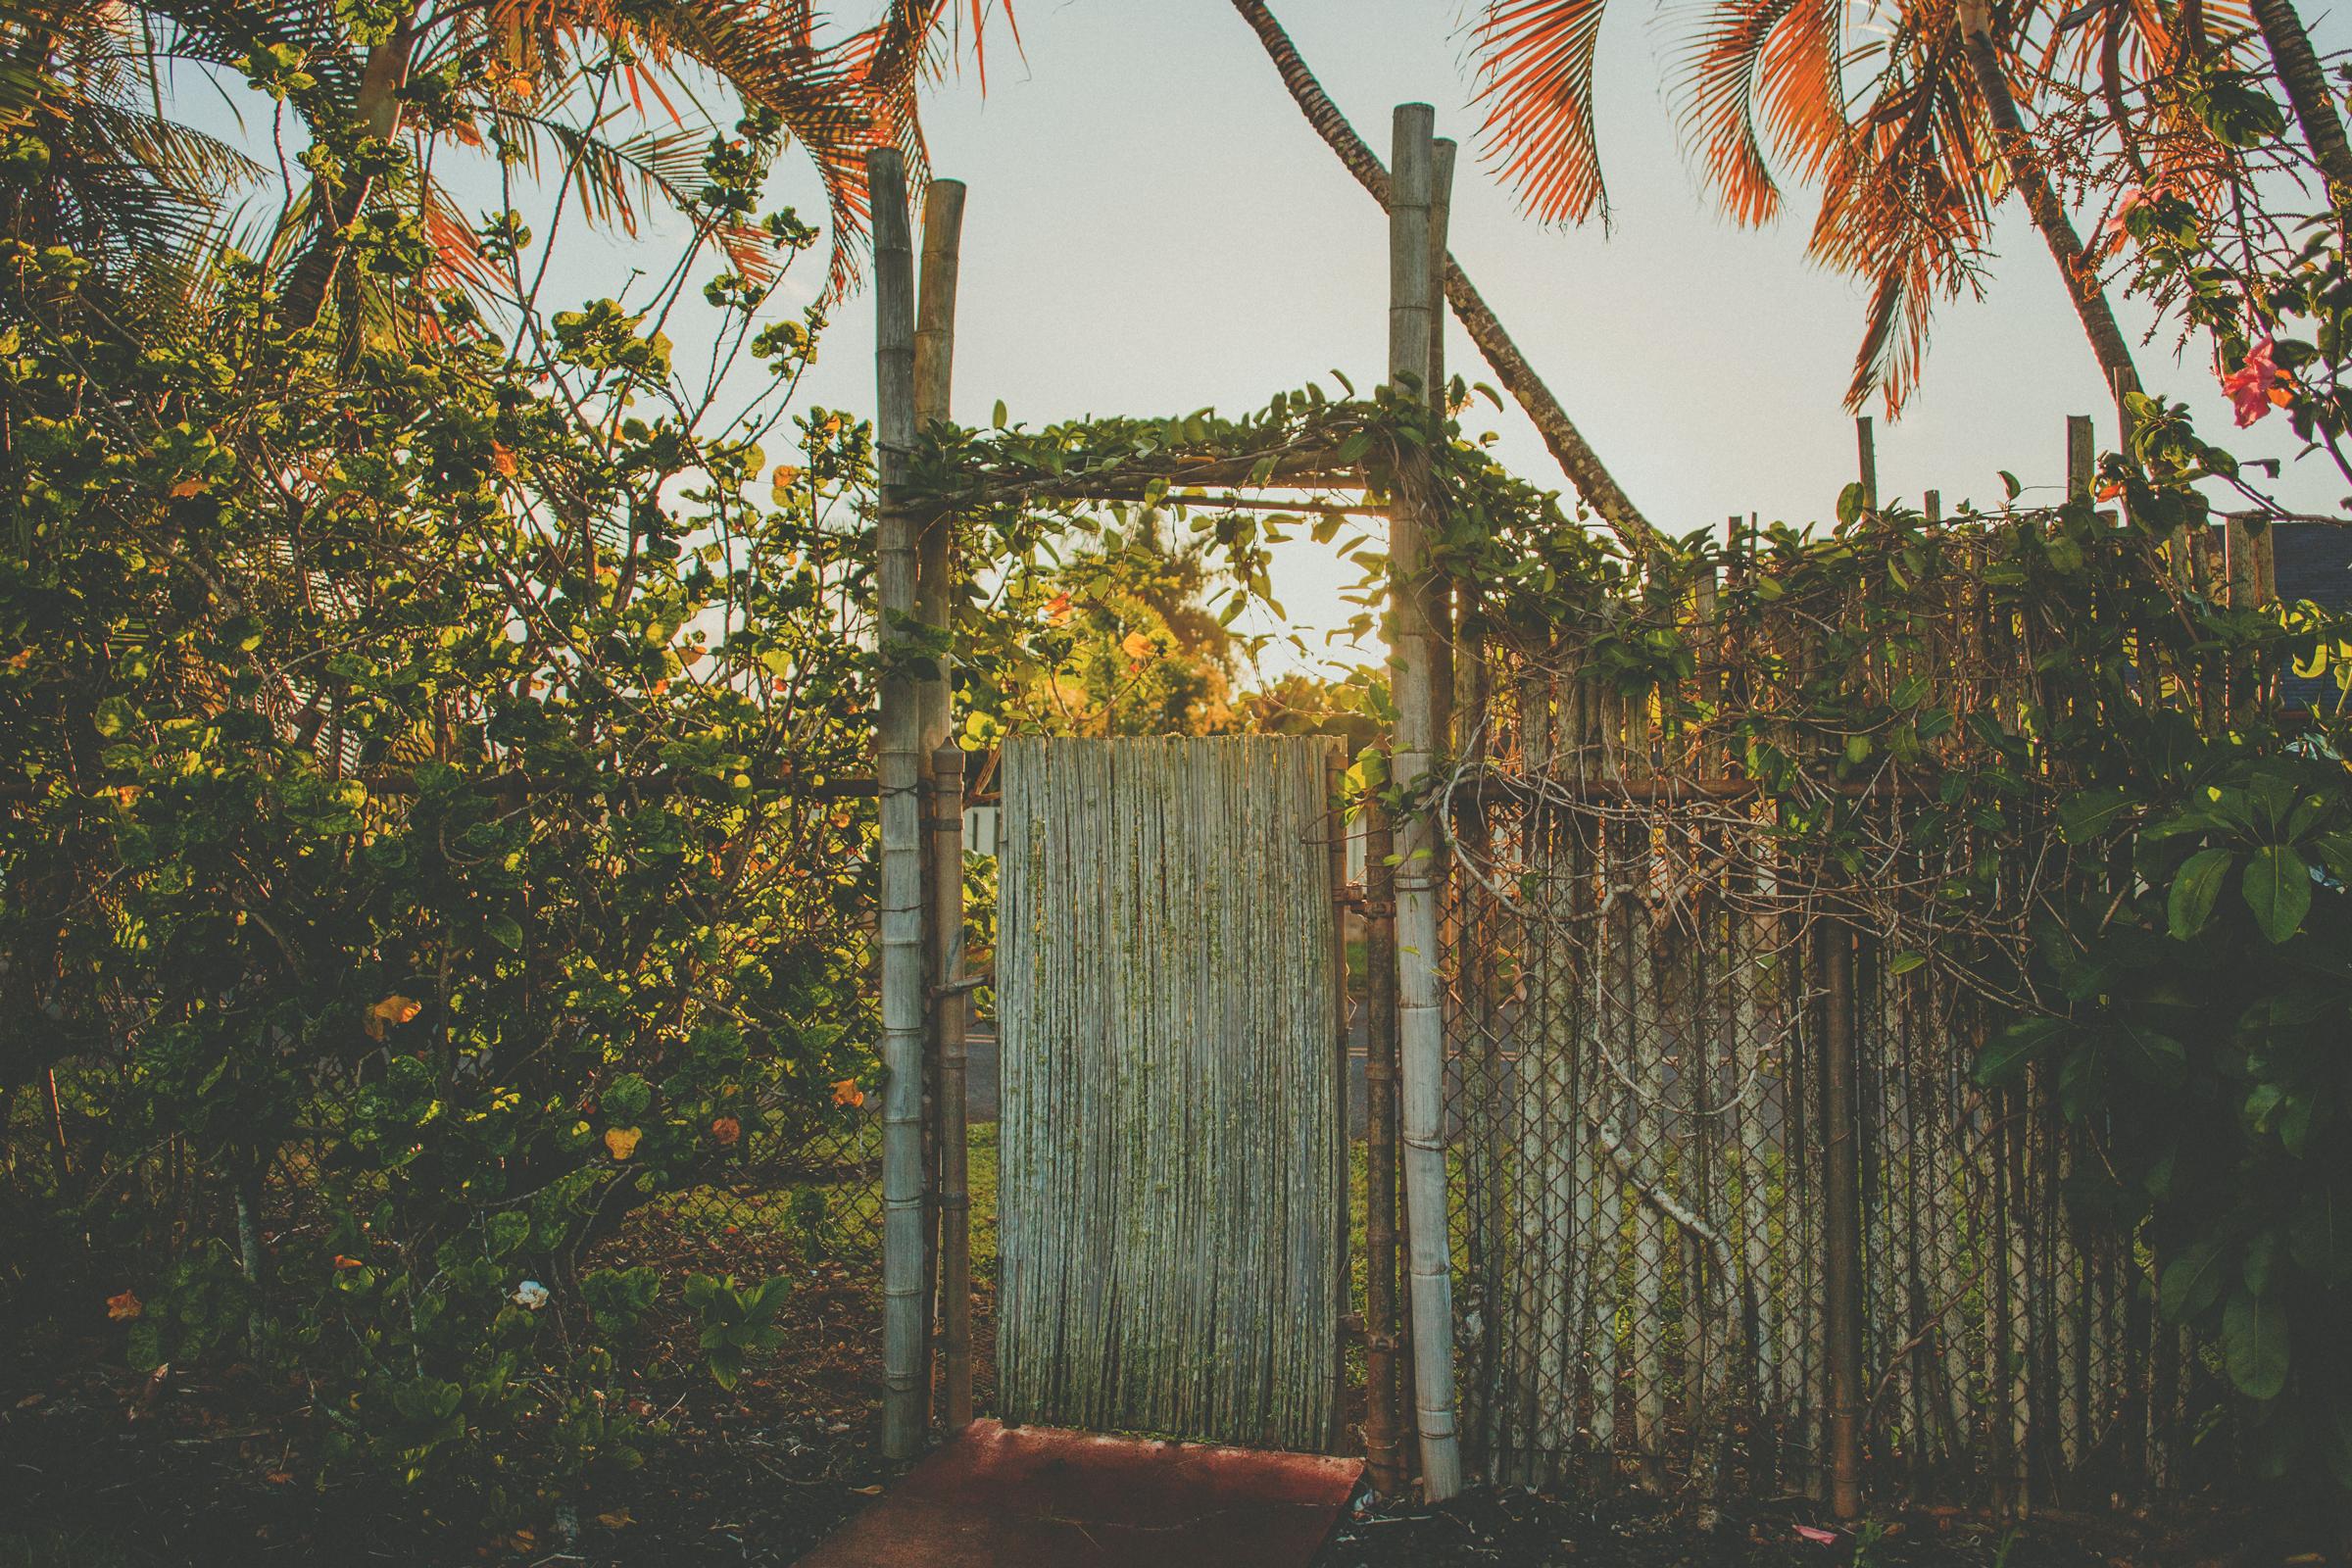 IMG_2250-KAUAI-HAWAII-JENNIFER-PICARD-PHOTOGRAPHY.jpg